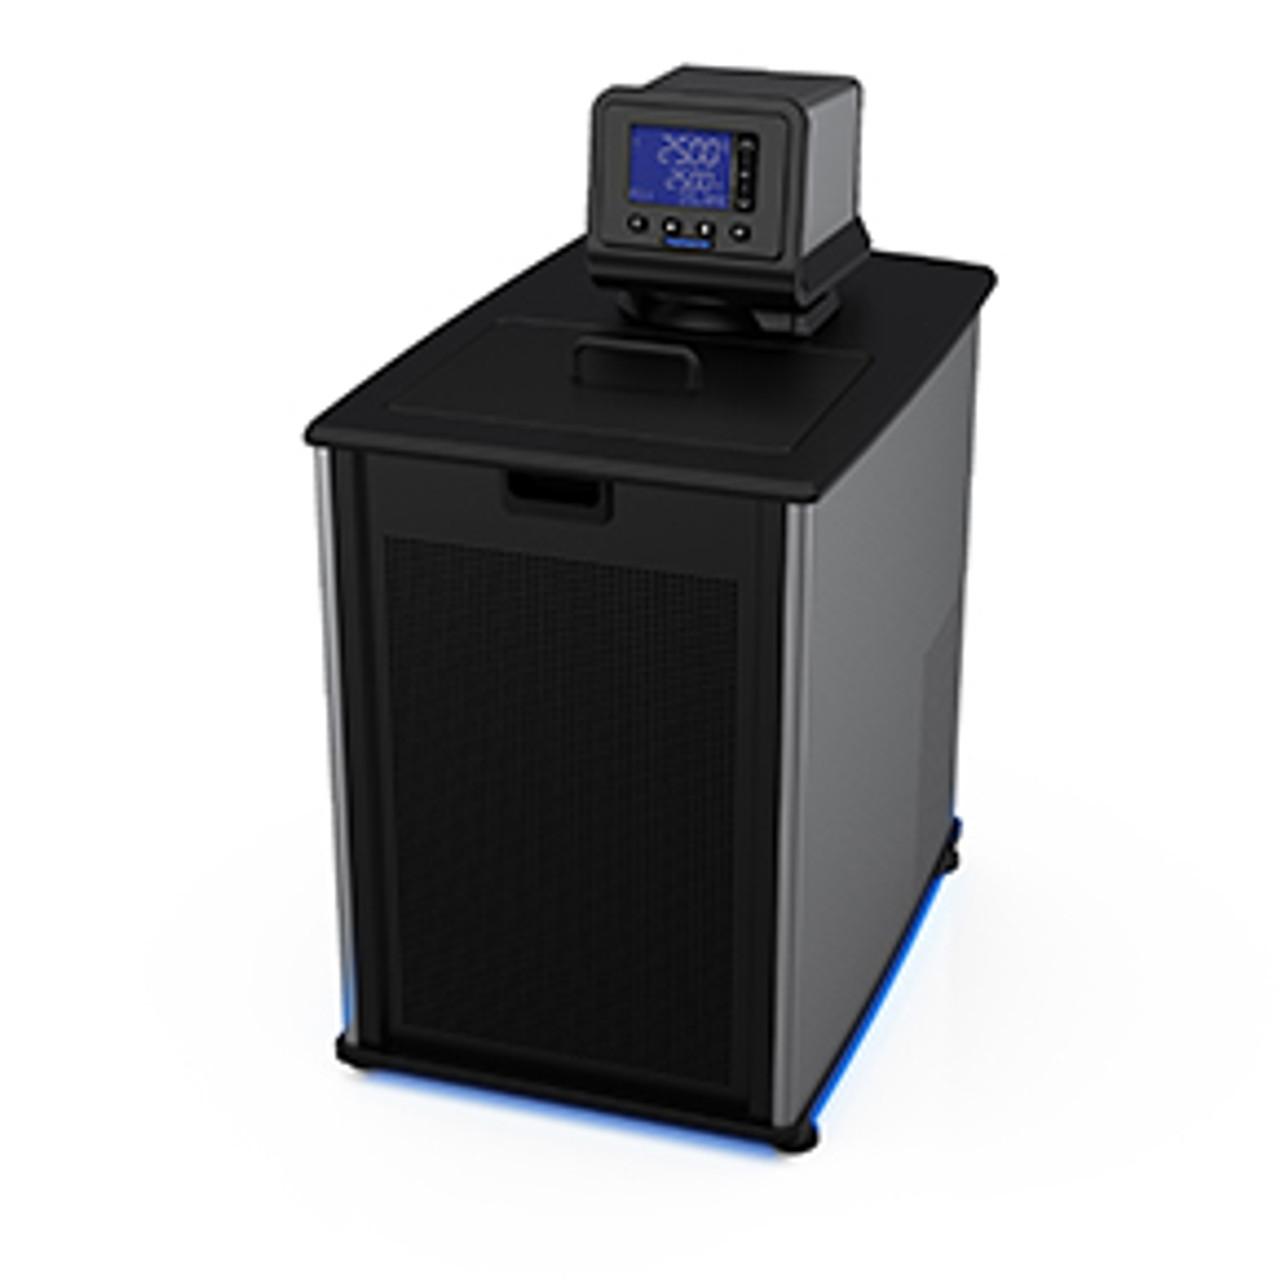 Polyscience 15 Liter Advanced Digital Refrigerated Circulator (-40°C/200°C)